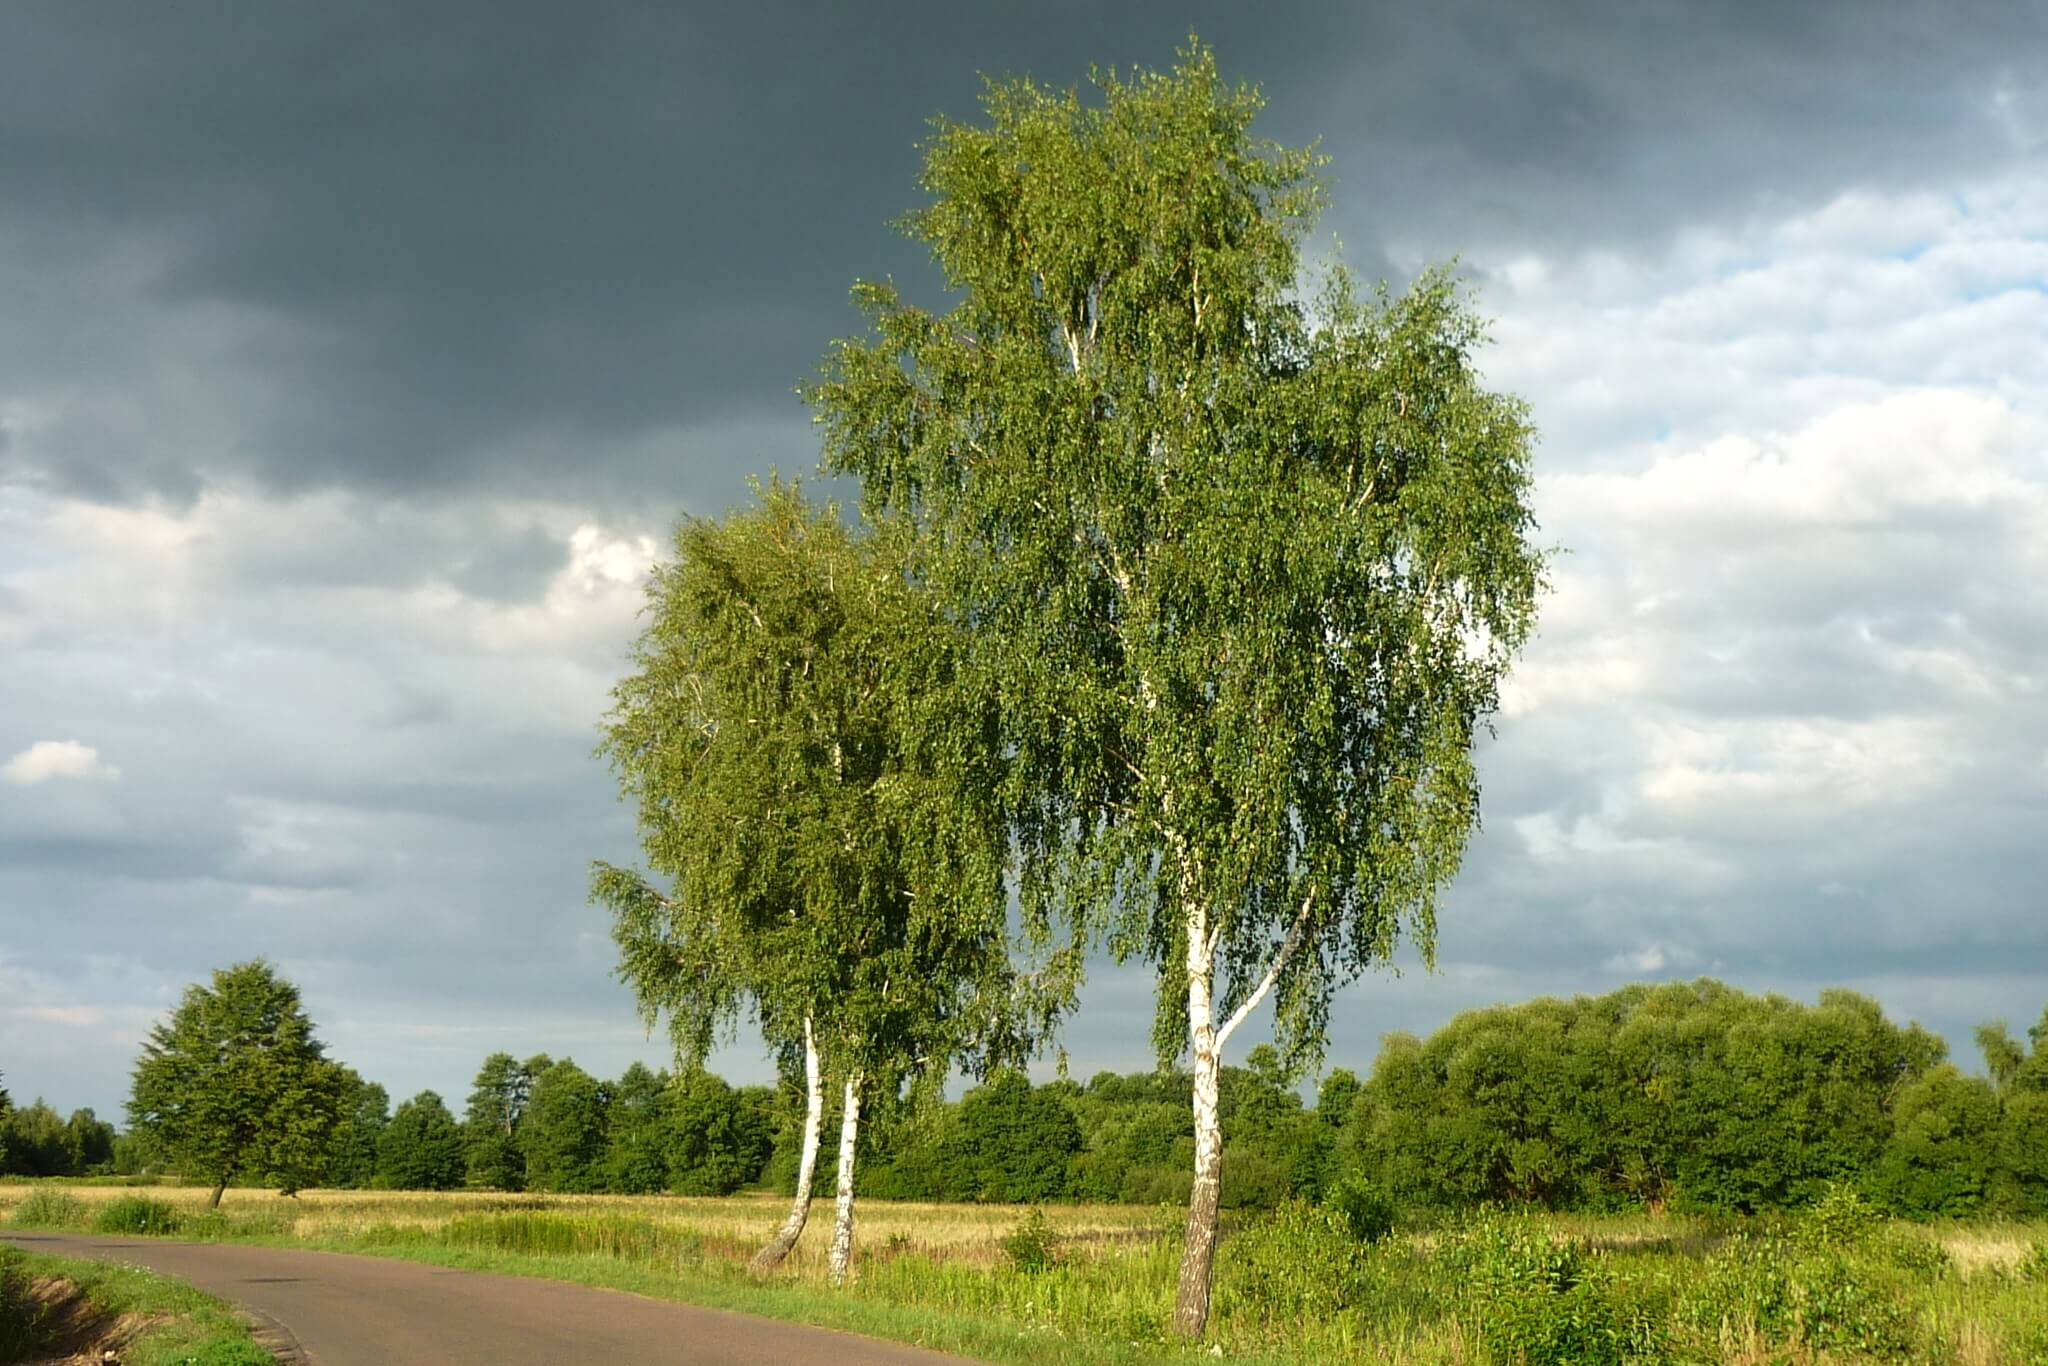 Betula verrucosa, Betula pendula – brzoza brodawkowata, brzoza zwisła